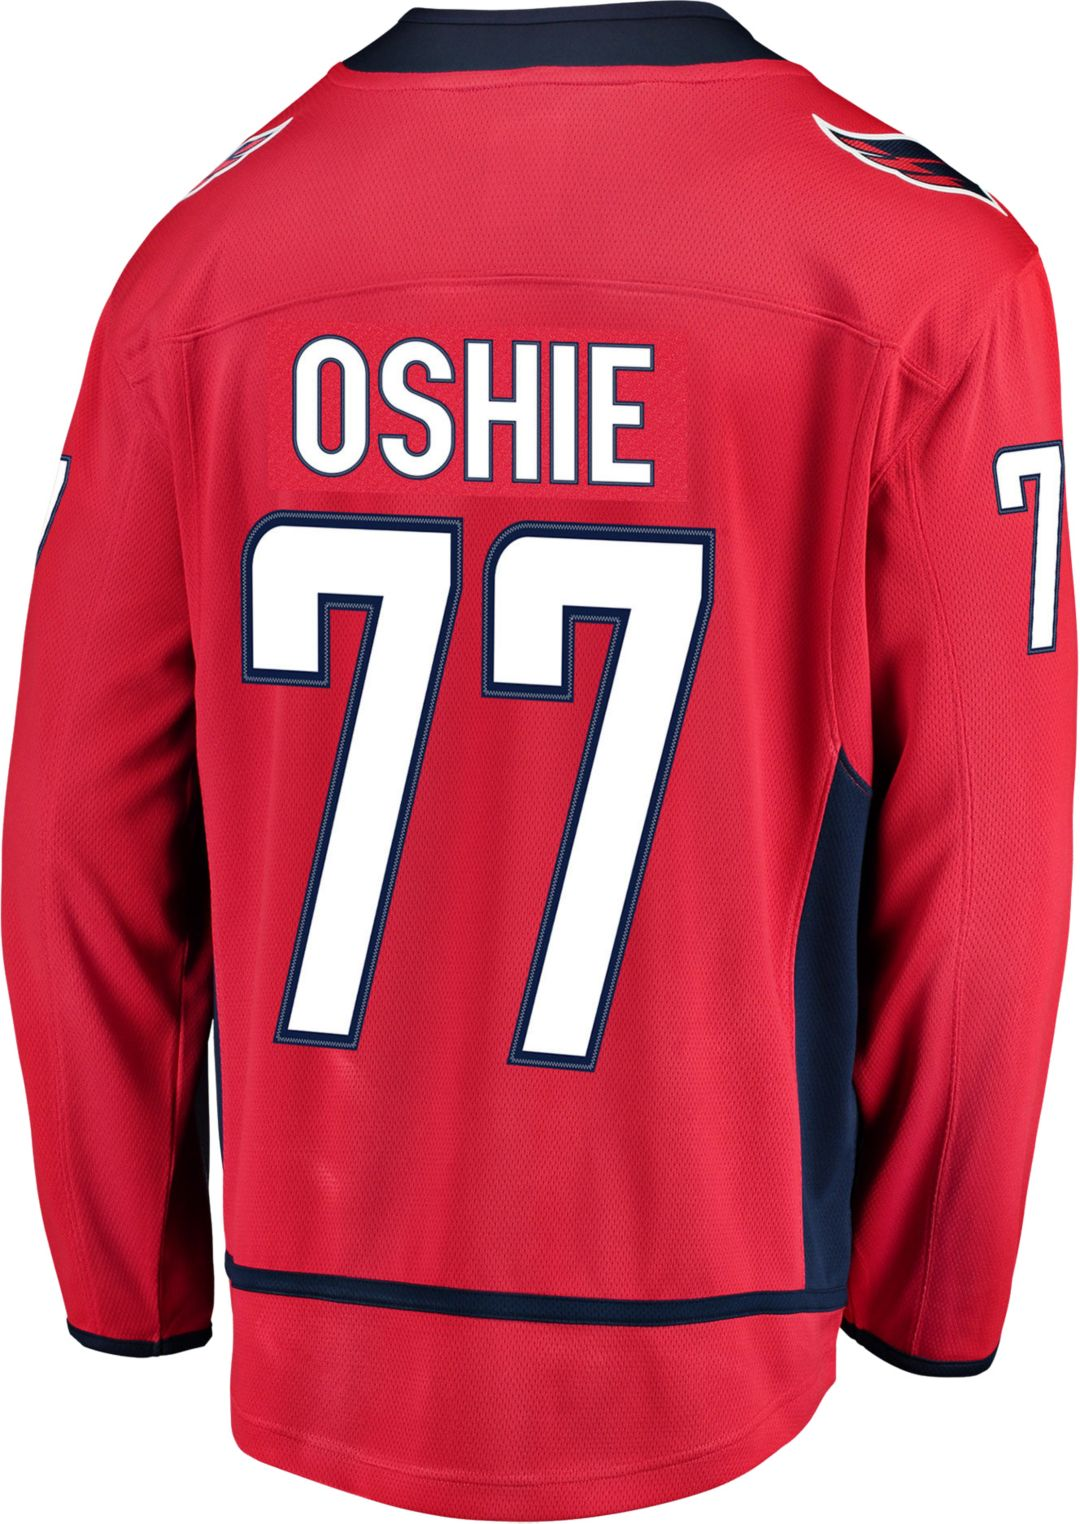 hot sales f8164 dfcc8 NHL Men's Washington Capitals T.J. Oshie #77 Breakaway Home Replica Jersey